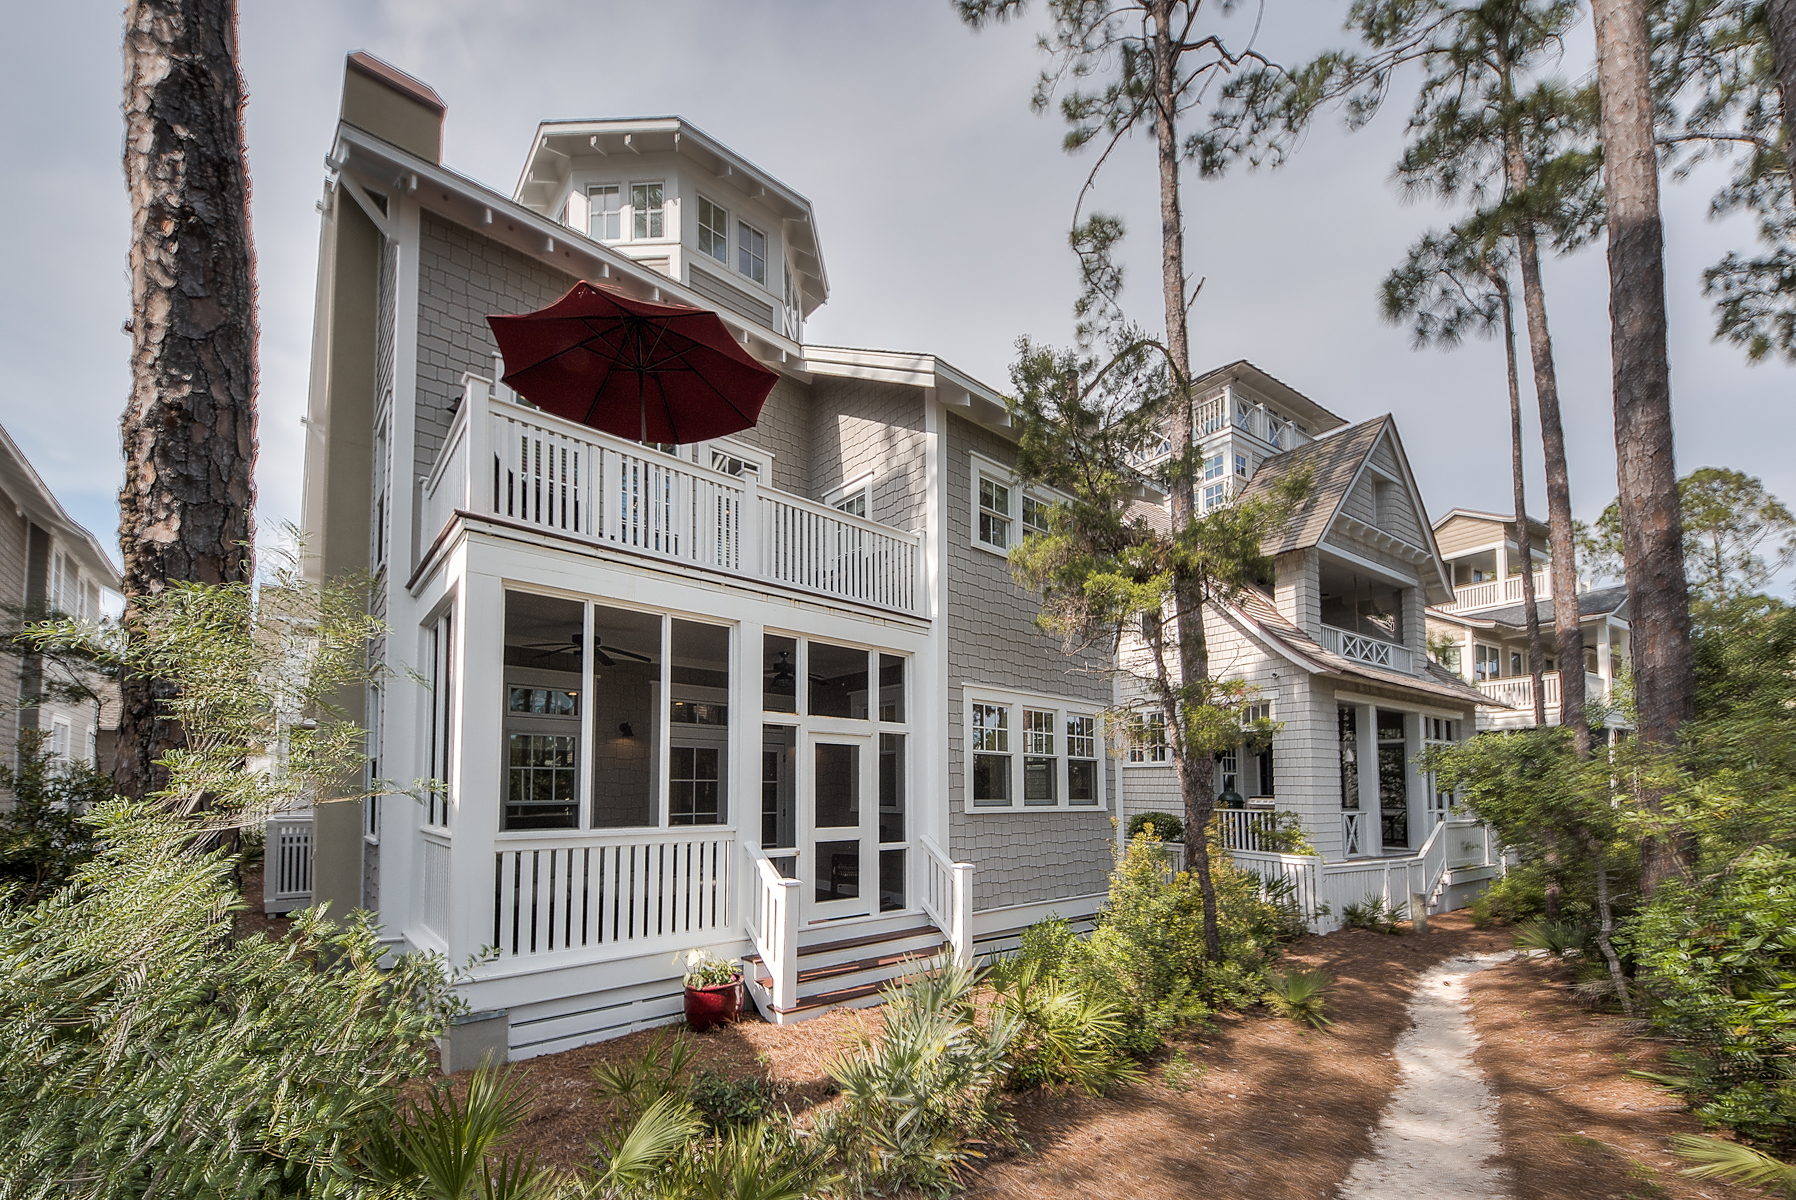 Maison unifamiliale pour l Vente à WATERSOUND BEACH HOME WITH CARRIAGE HOUSE AND OBSERVATORY 39 West Yacht Pond Lane Inlet Beach, Florida, 32461 États-Unis